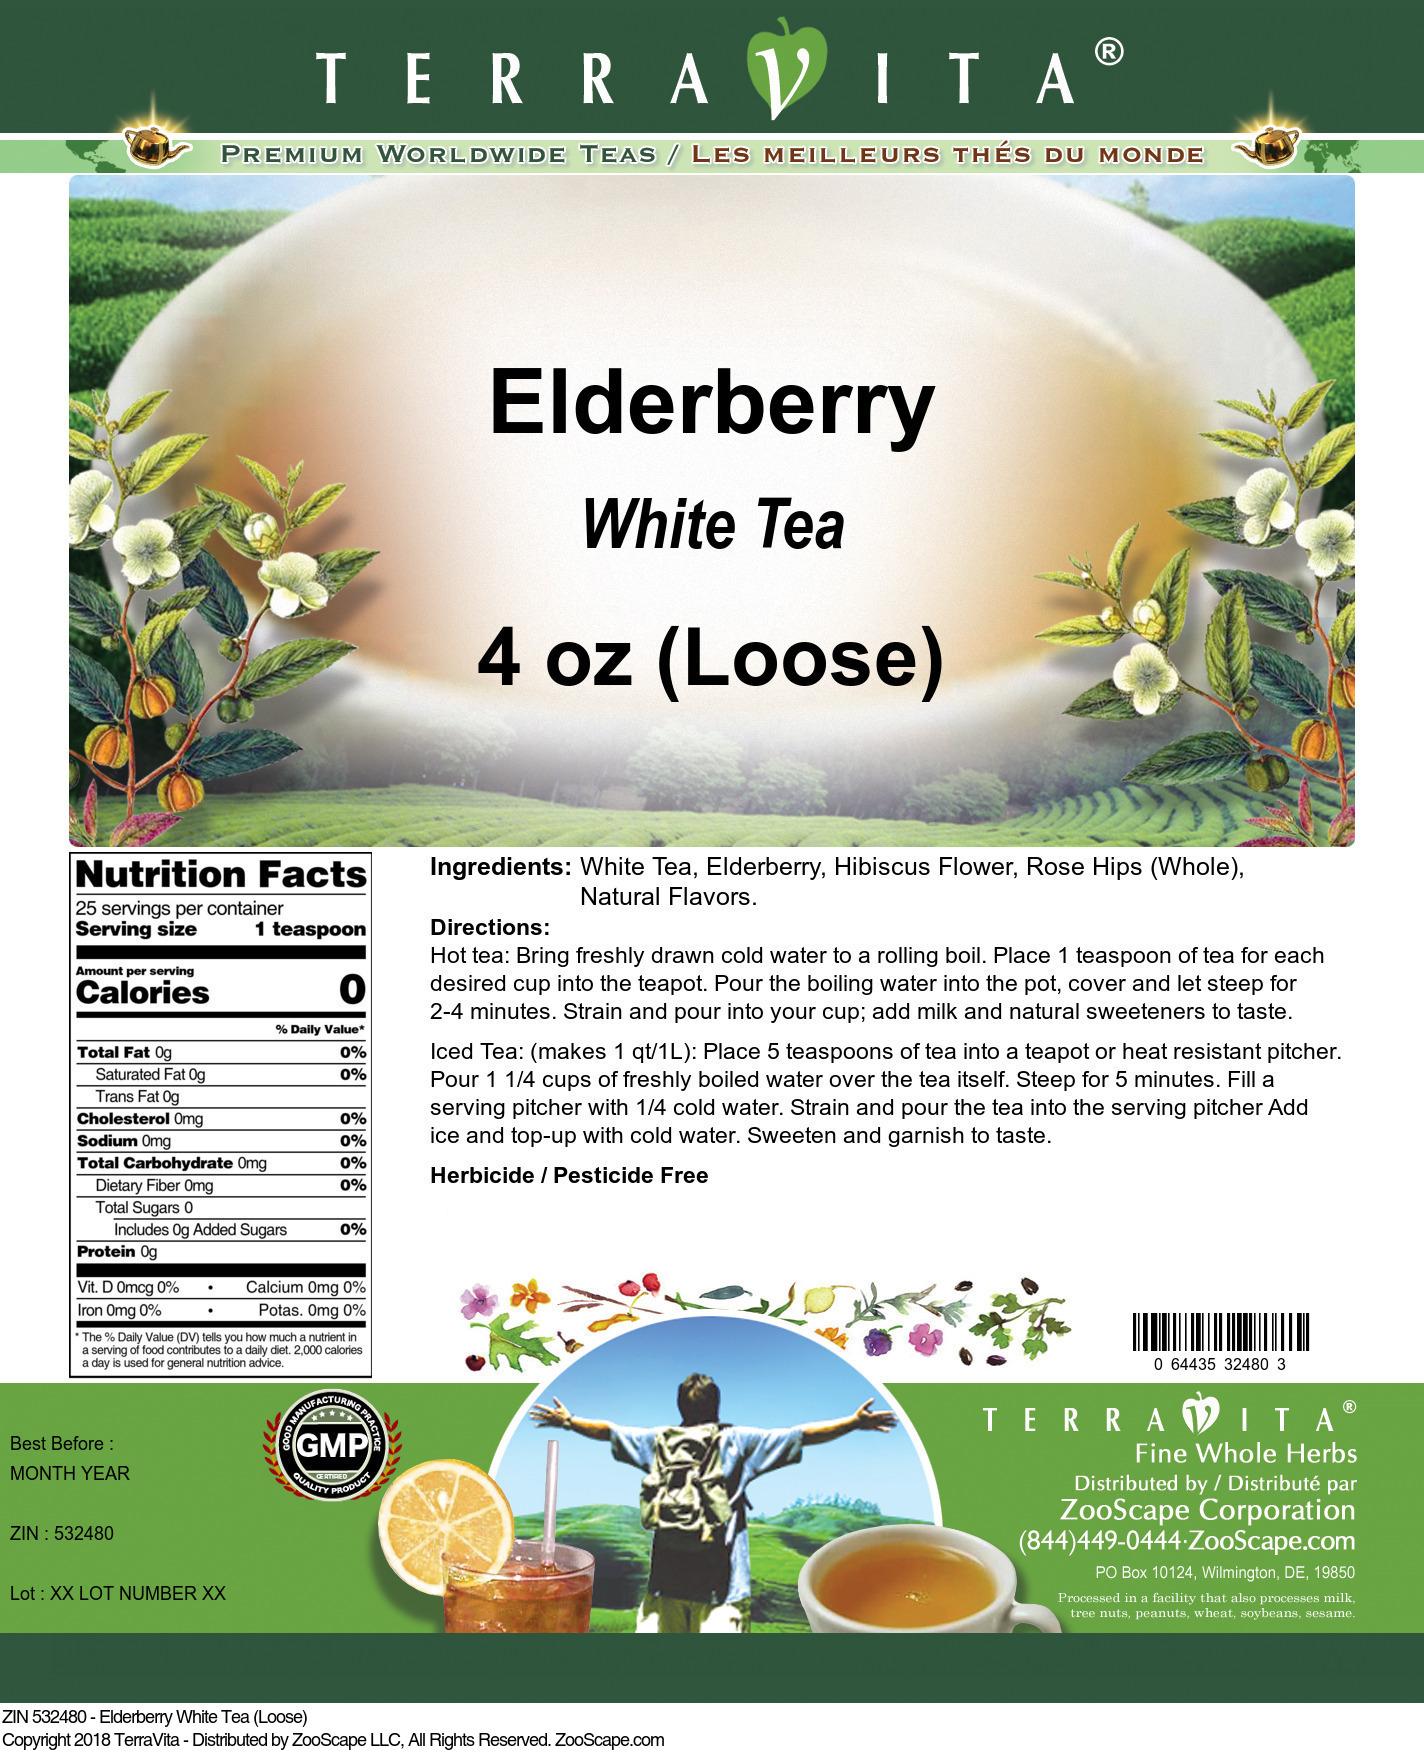 Elderberry White Tea (Loose)